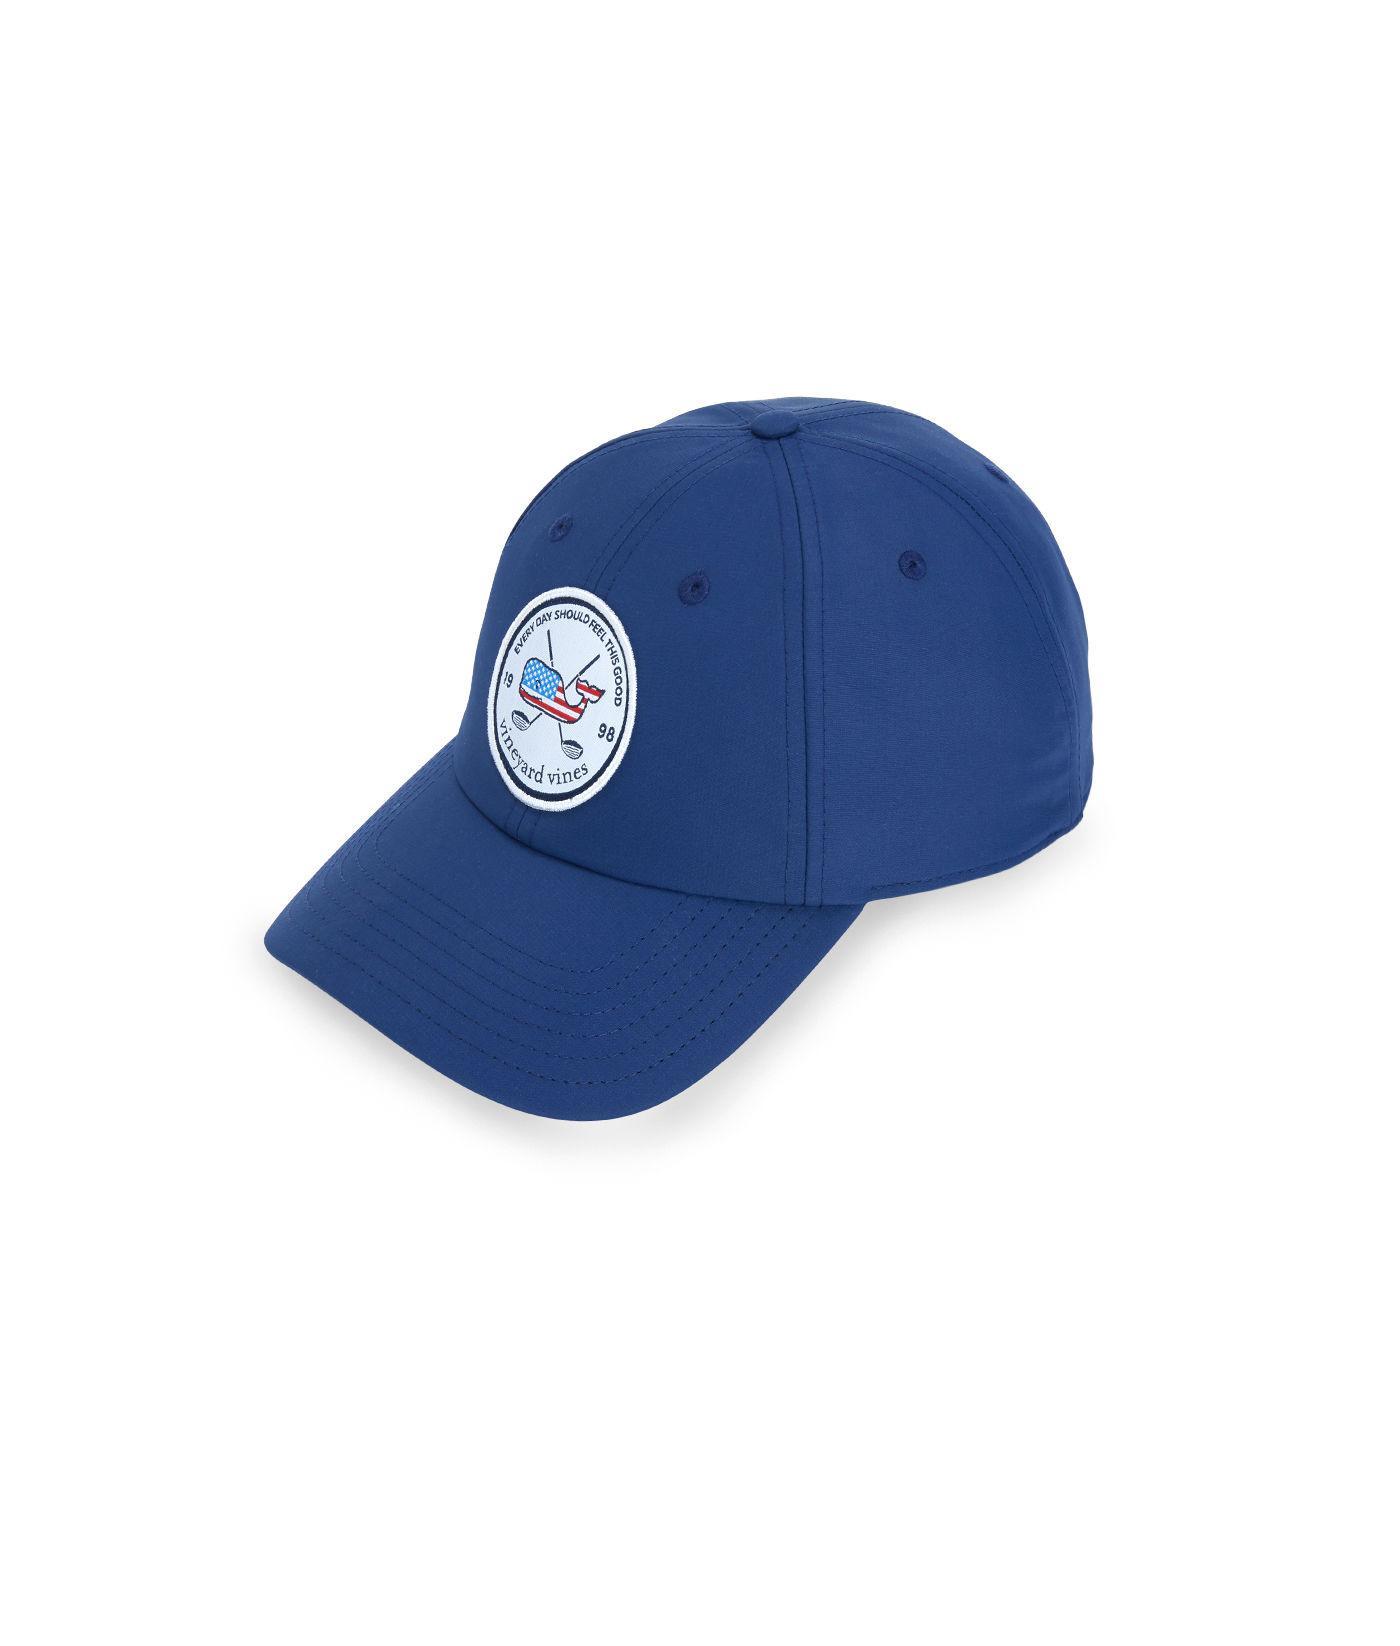 Vineyard Vines - Blue Golf Patch Performance Baseball Hat for Men - Lyst. View  fullscreen 60fb779b2cc9